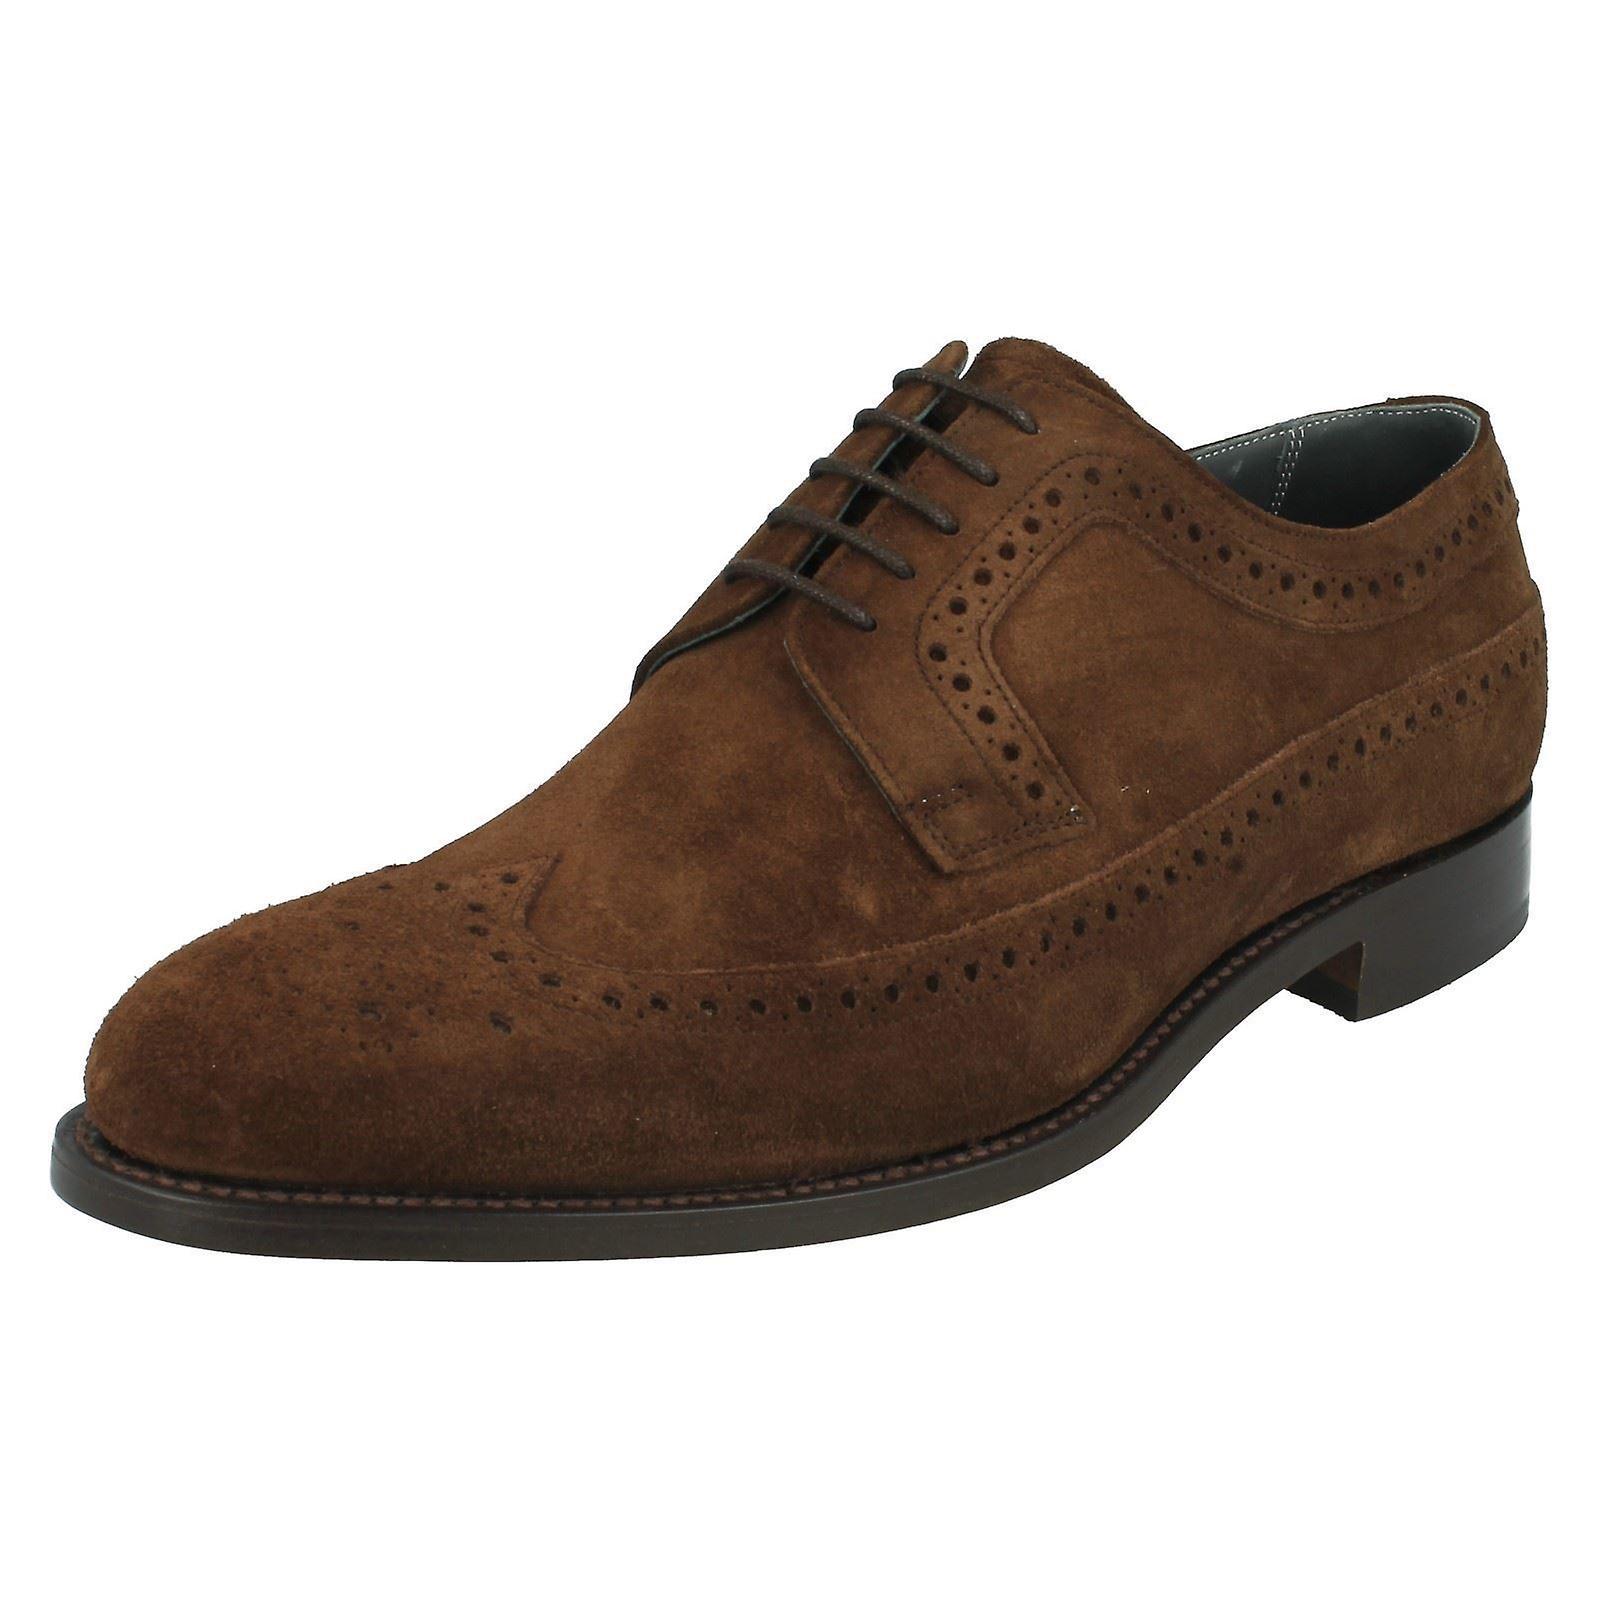 chaussures de mens Barker Suede formelle Brogue Woodbridge